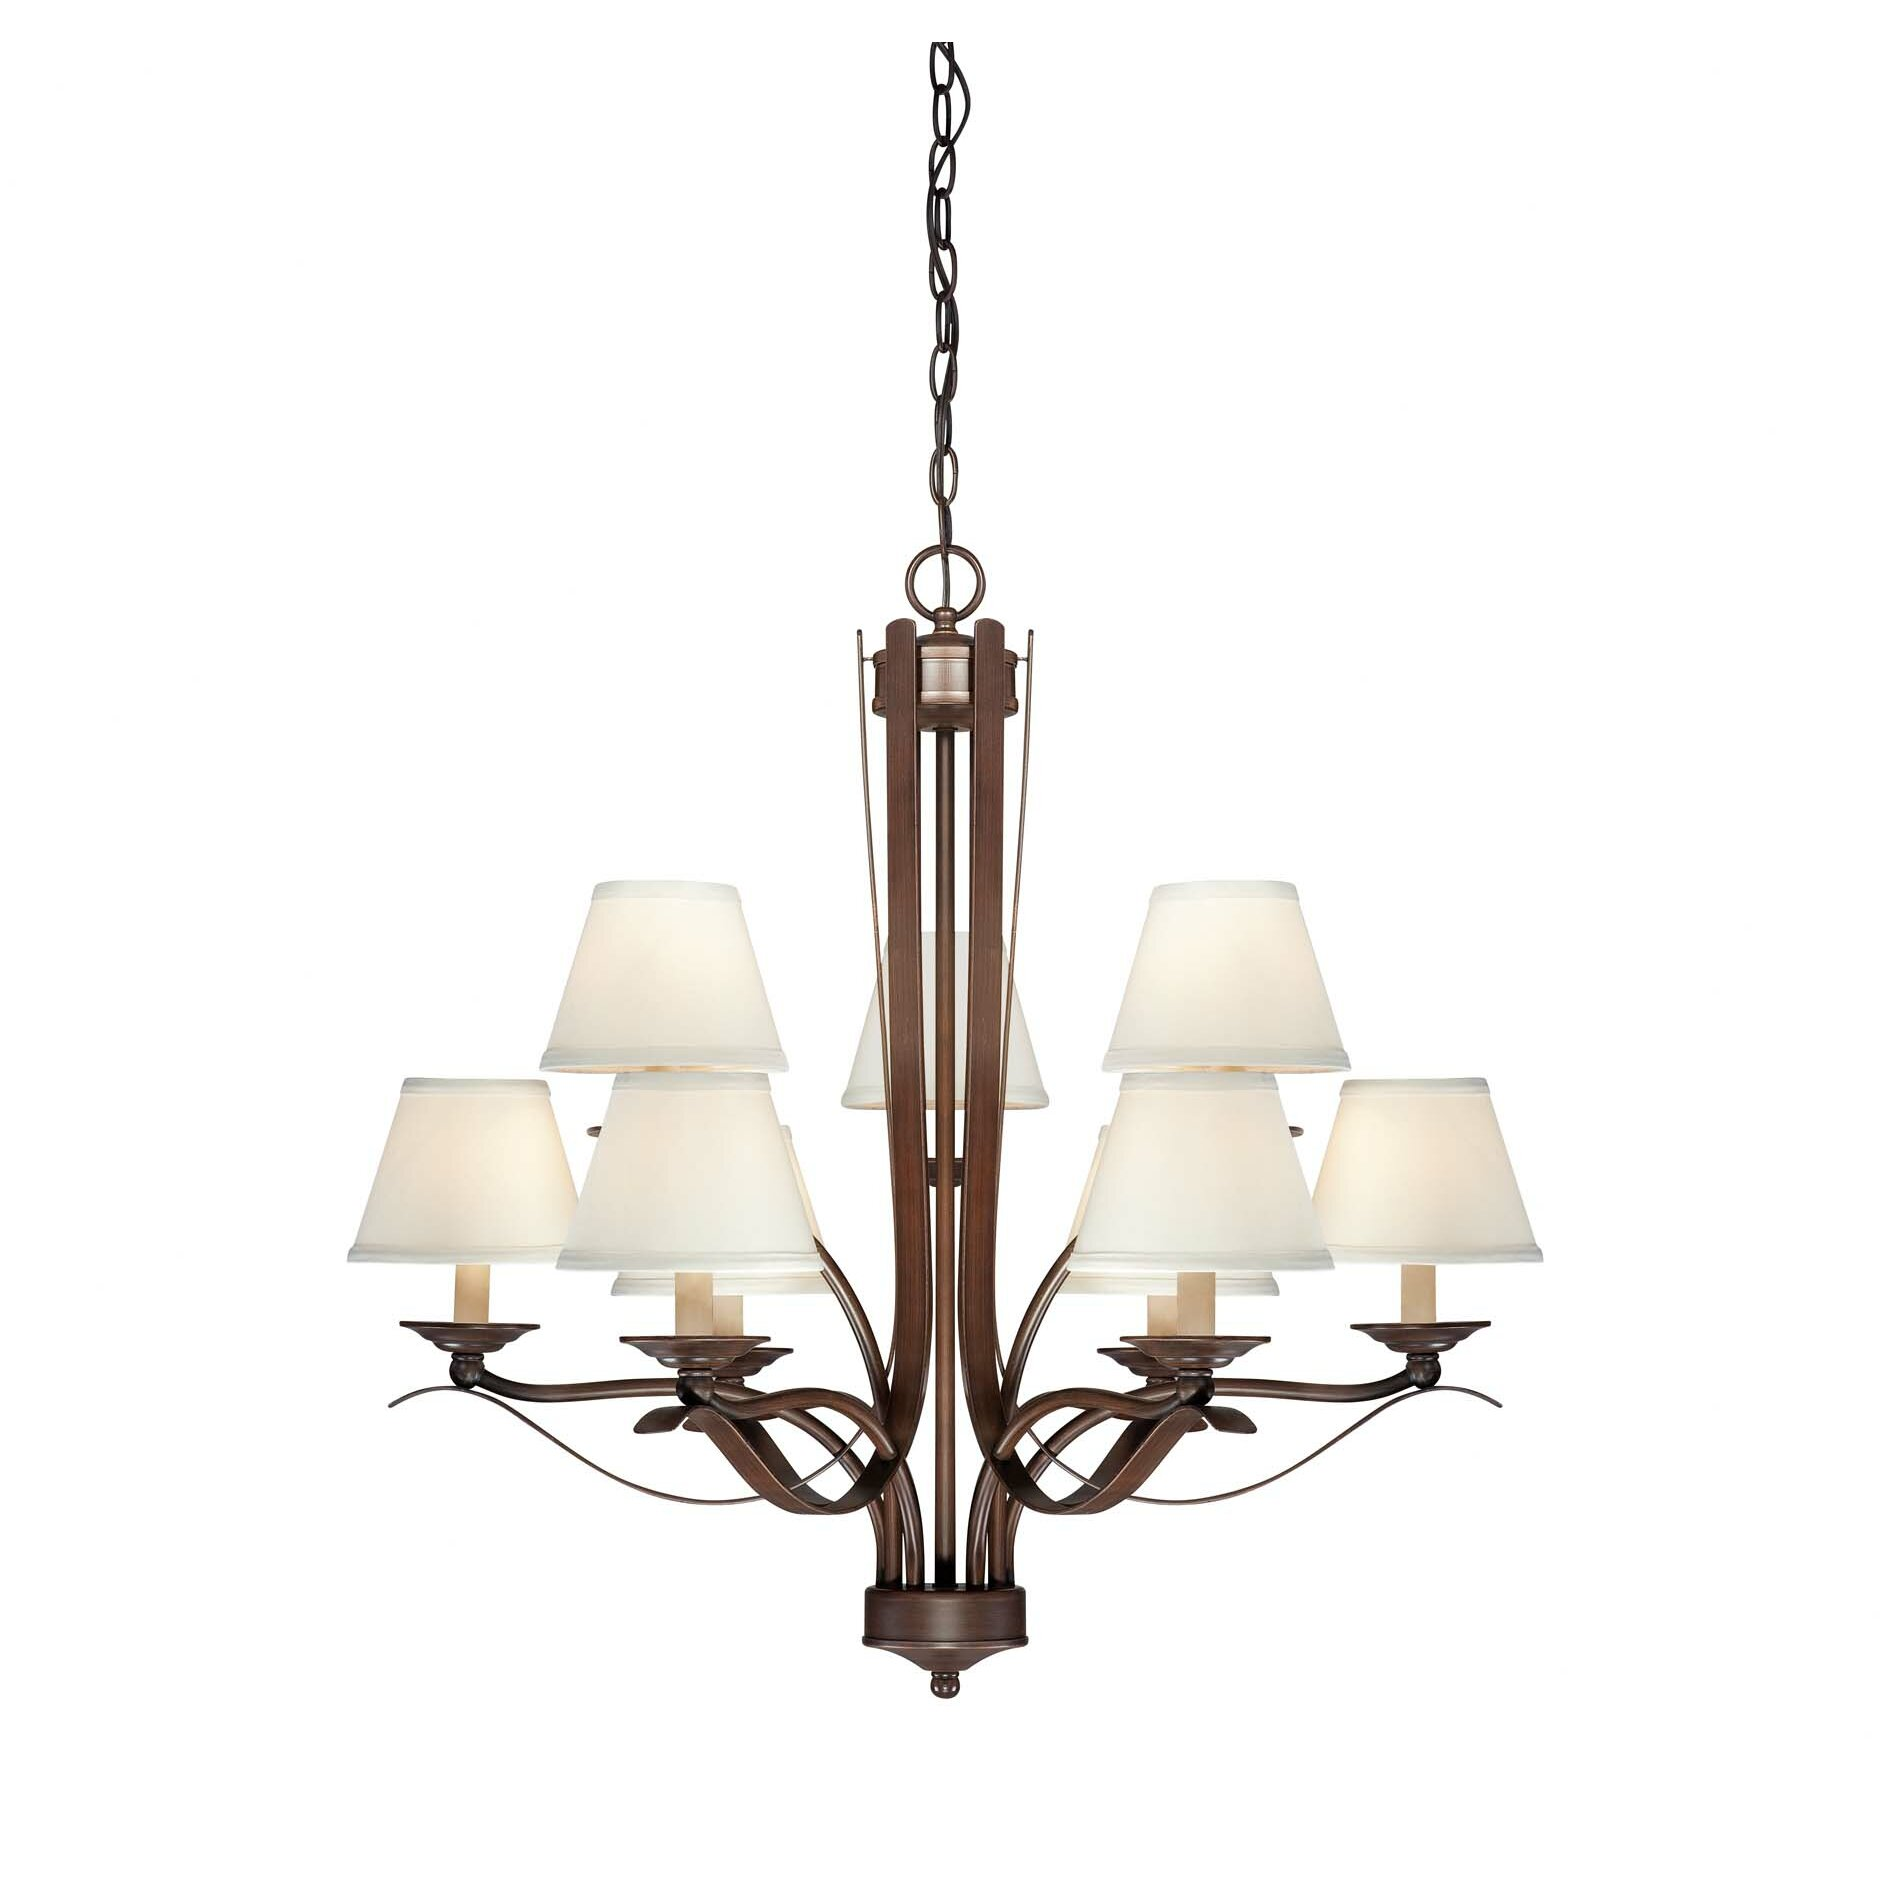 Savoy house maremma 9 light chandelier wayfair for Www savoyhouse com